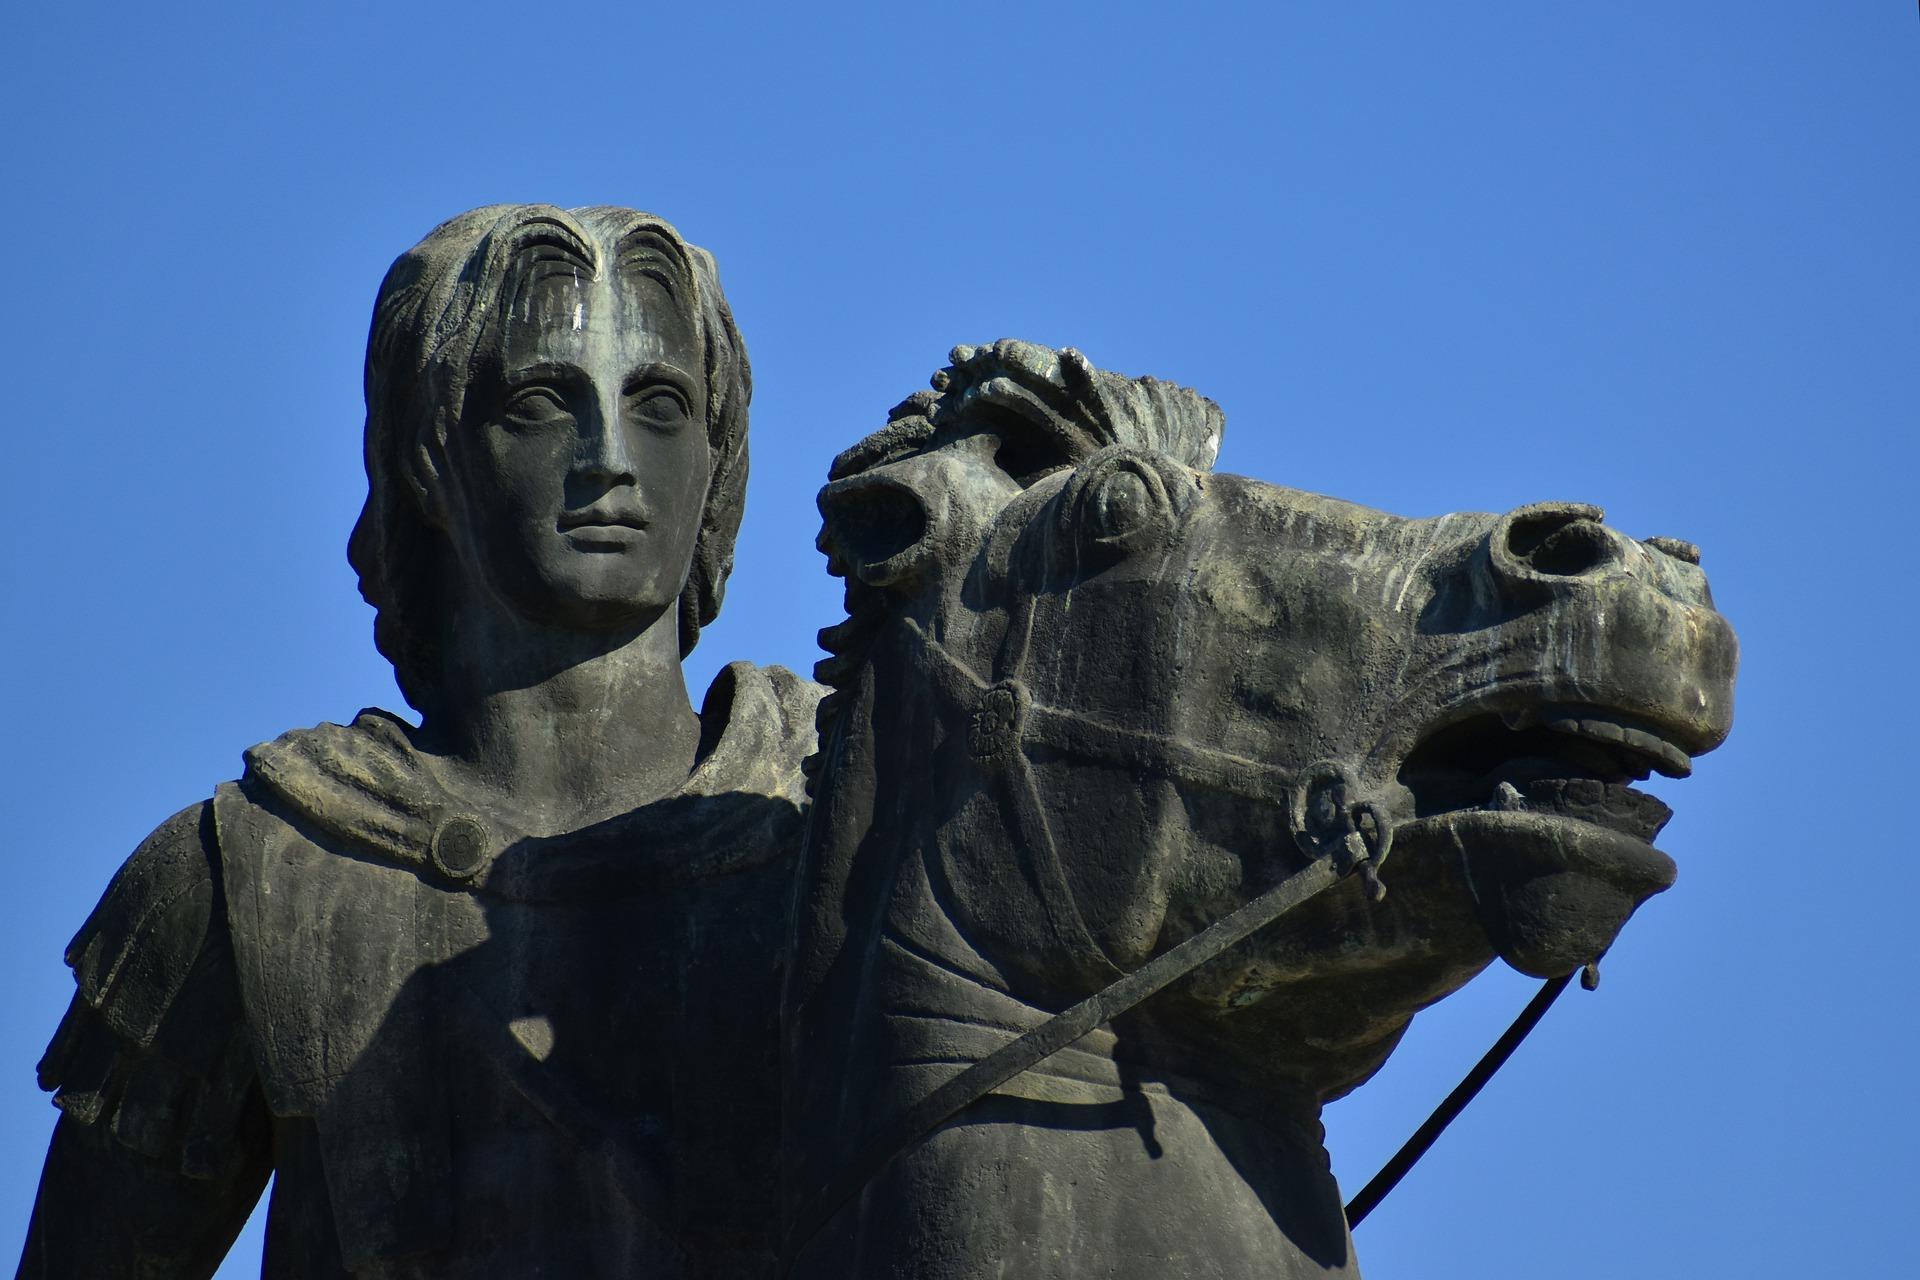 statue-5815521_1920.jpg